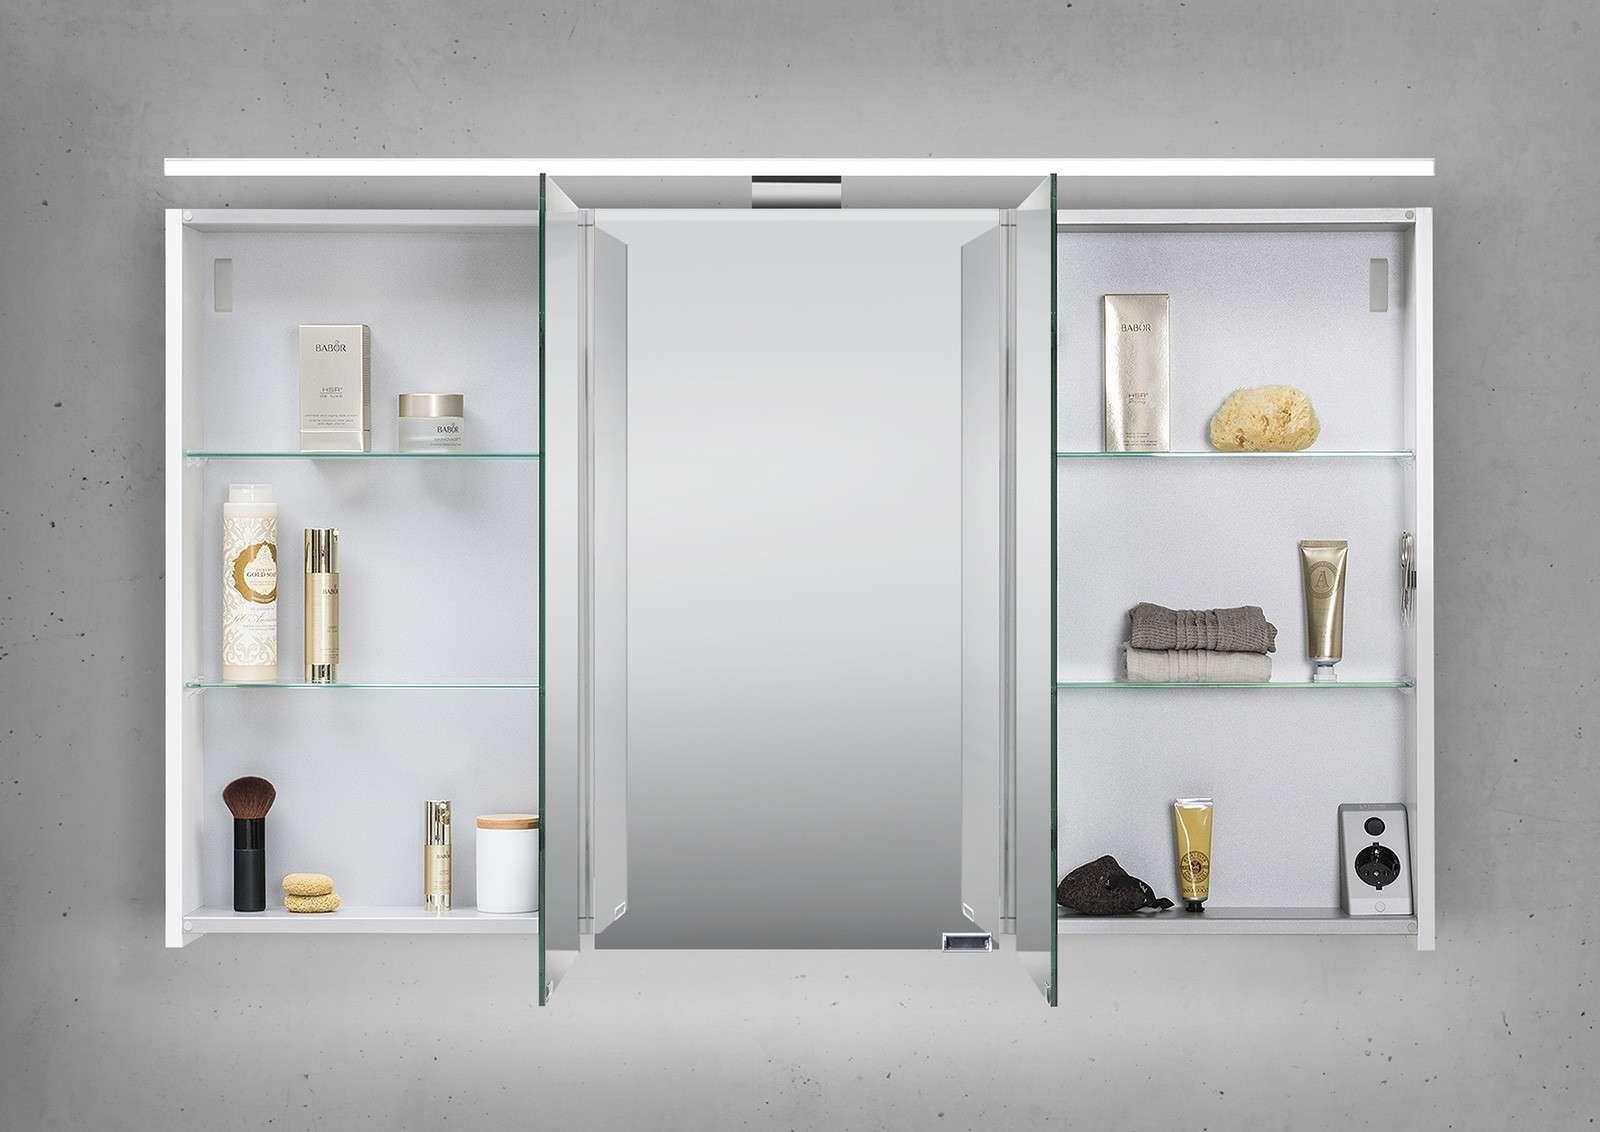 Spiegelschrank 120 Cm Led Beleuchtung Doppelseitig Verspiegelt In 2020 Badezimmer Spiegelschrank Spiegelschrank Badezimmer